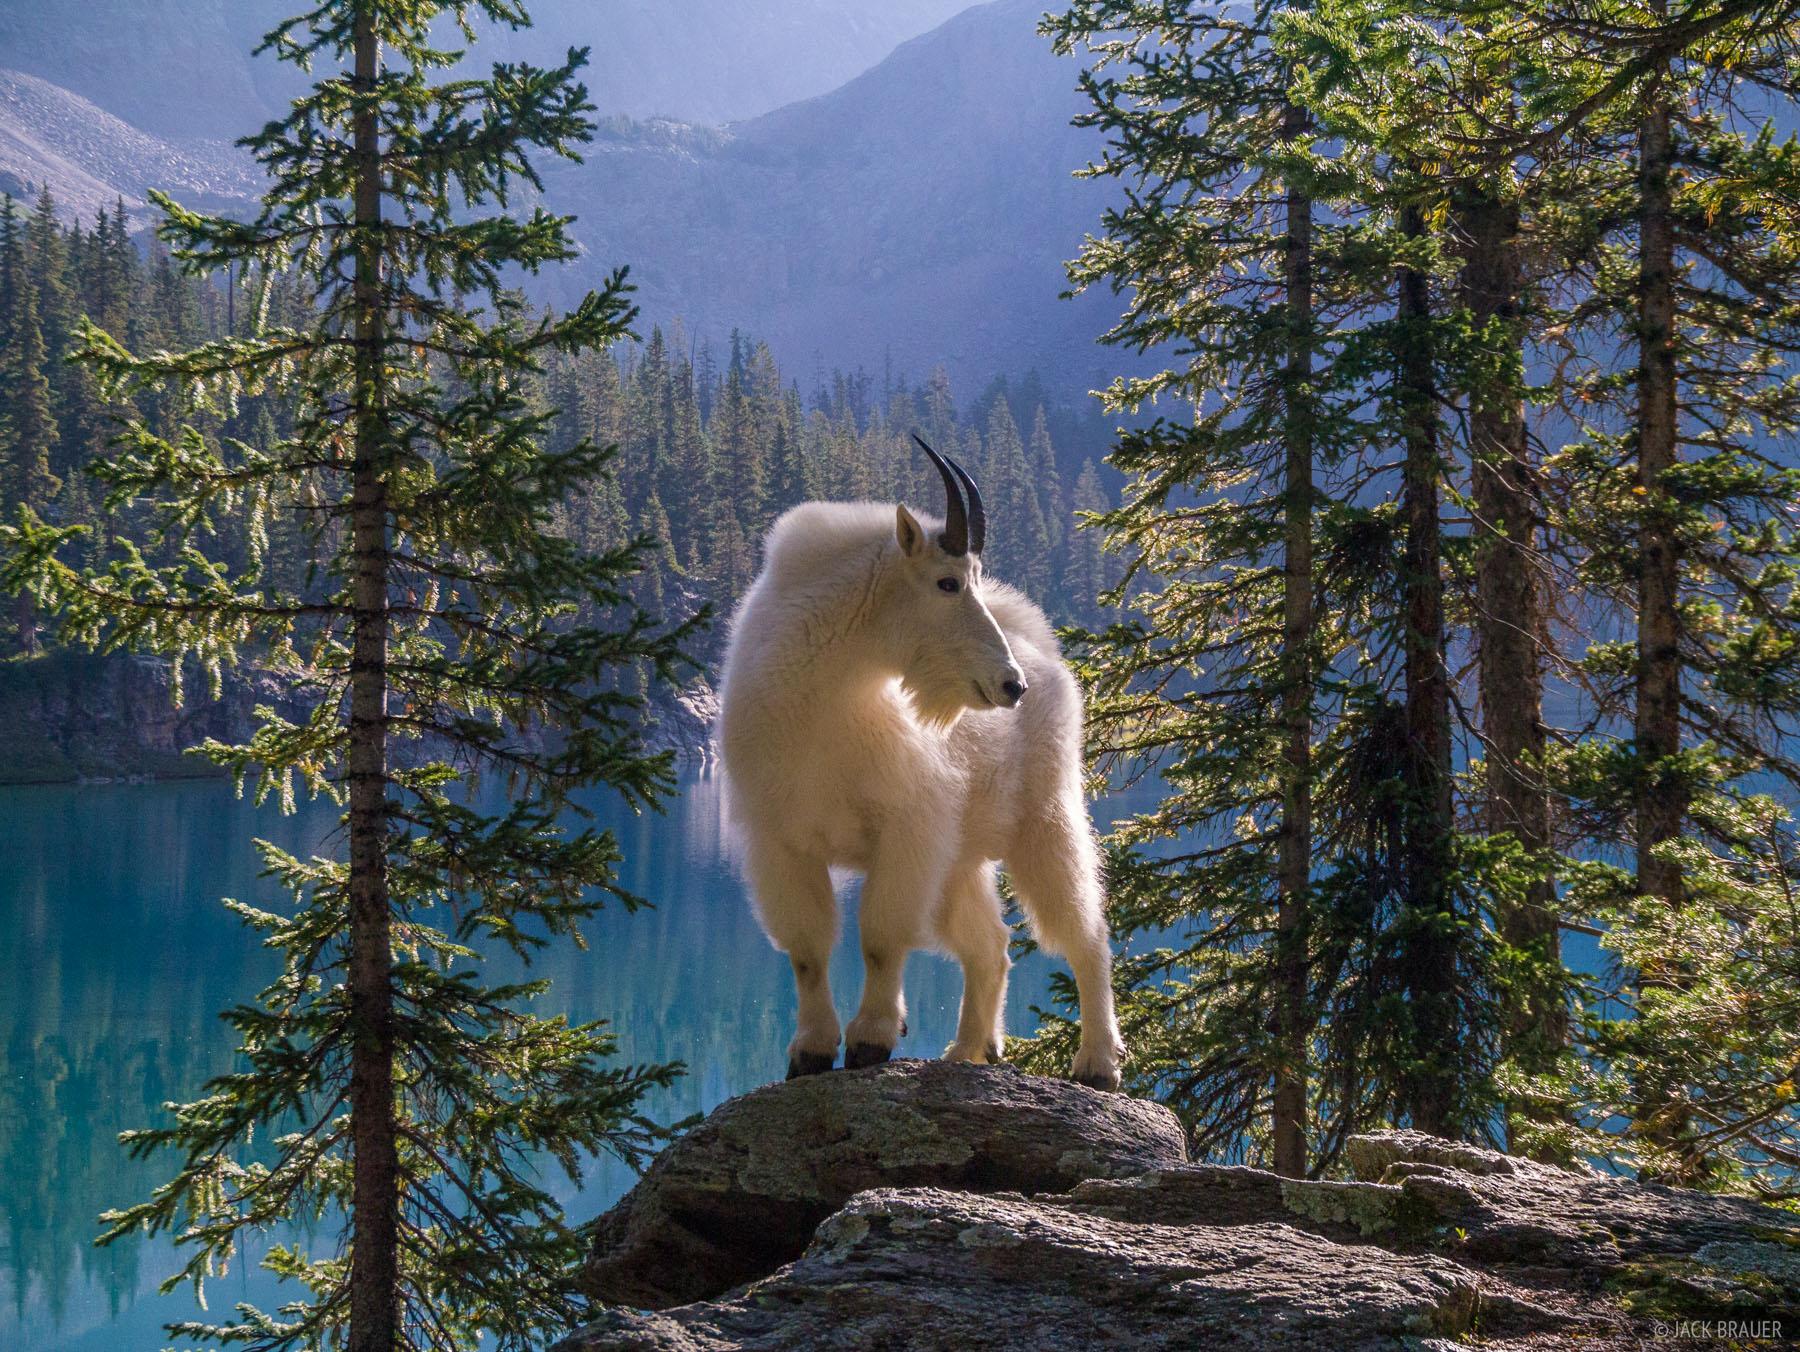 Mountain goat, Weminuche Wilderness, San Juan Mountains, Colorado, photo